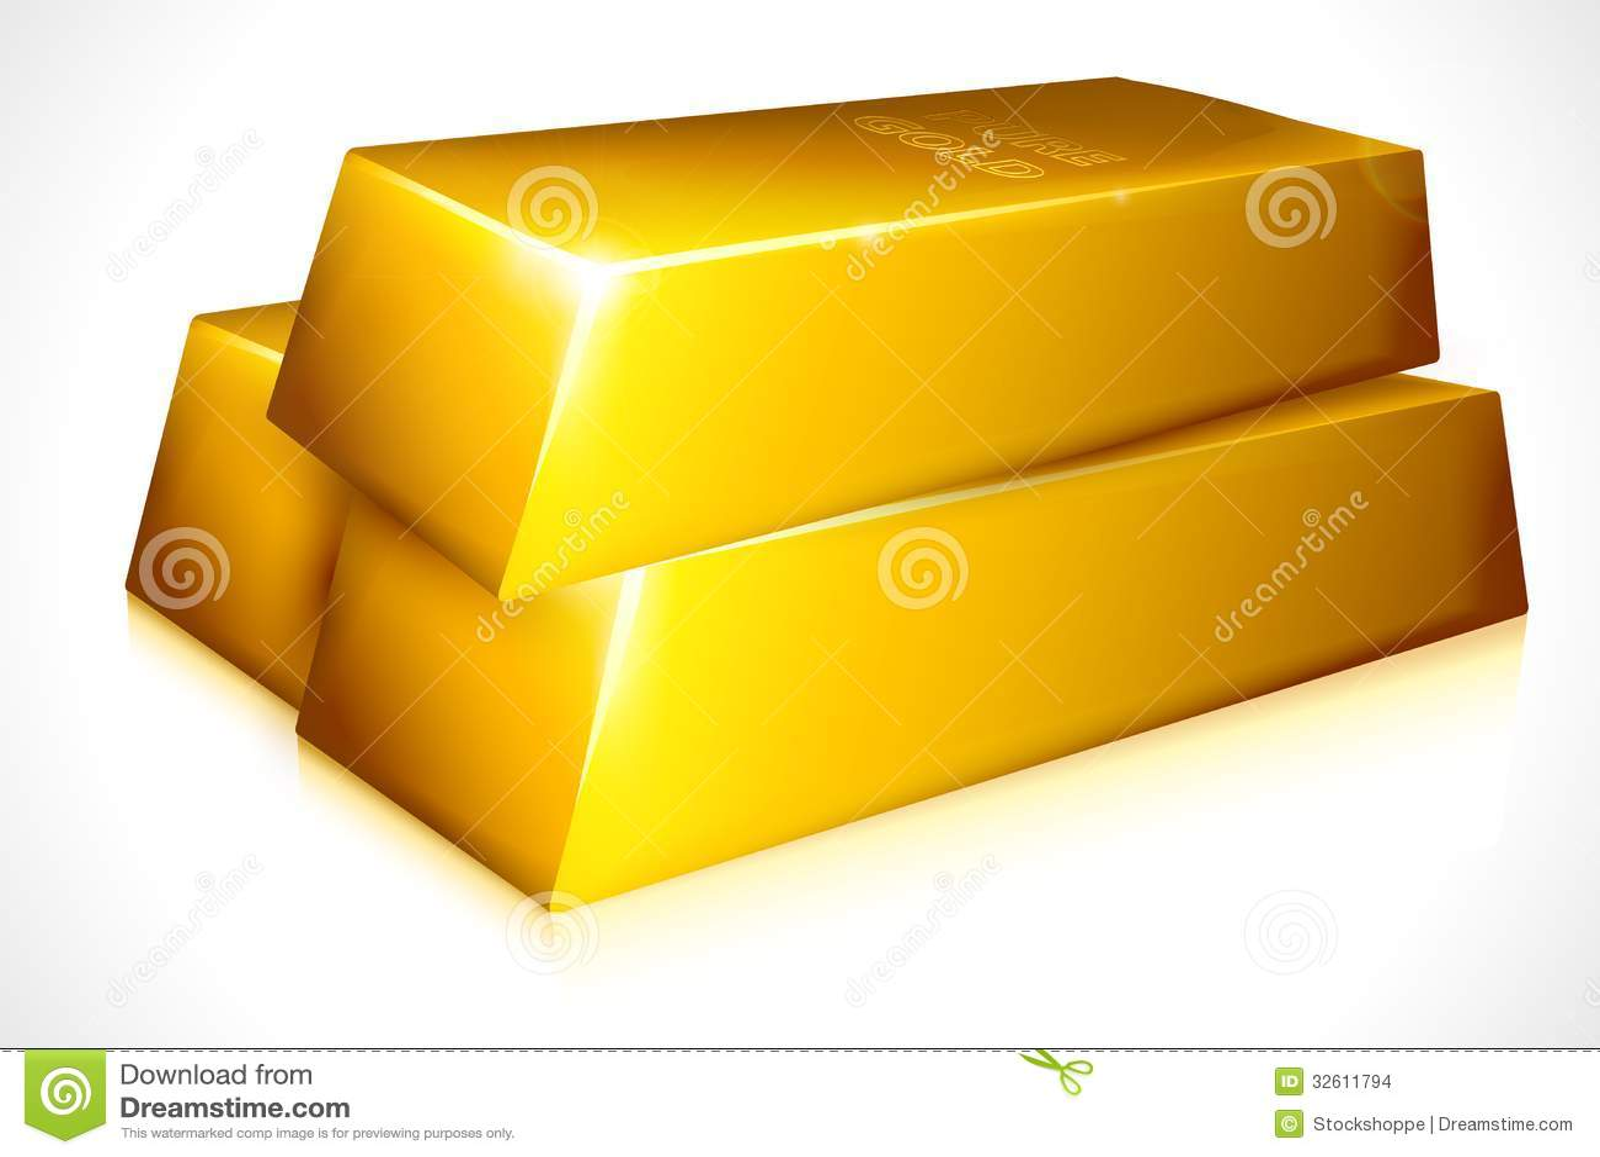 ... of gold brick agai...